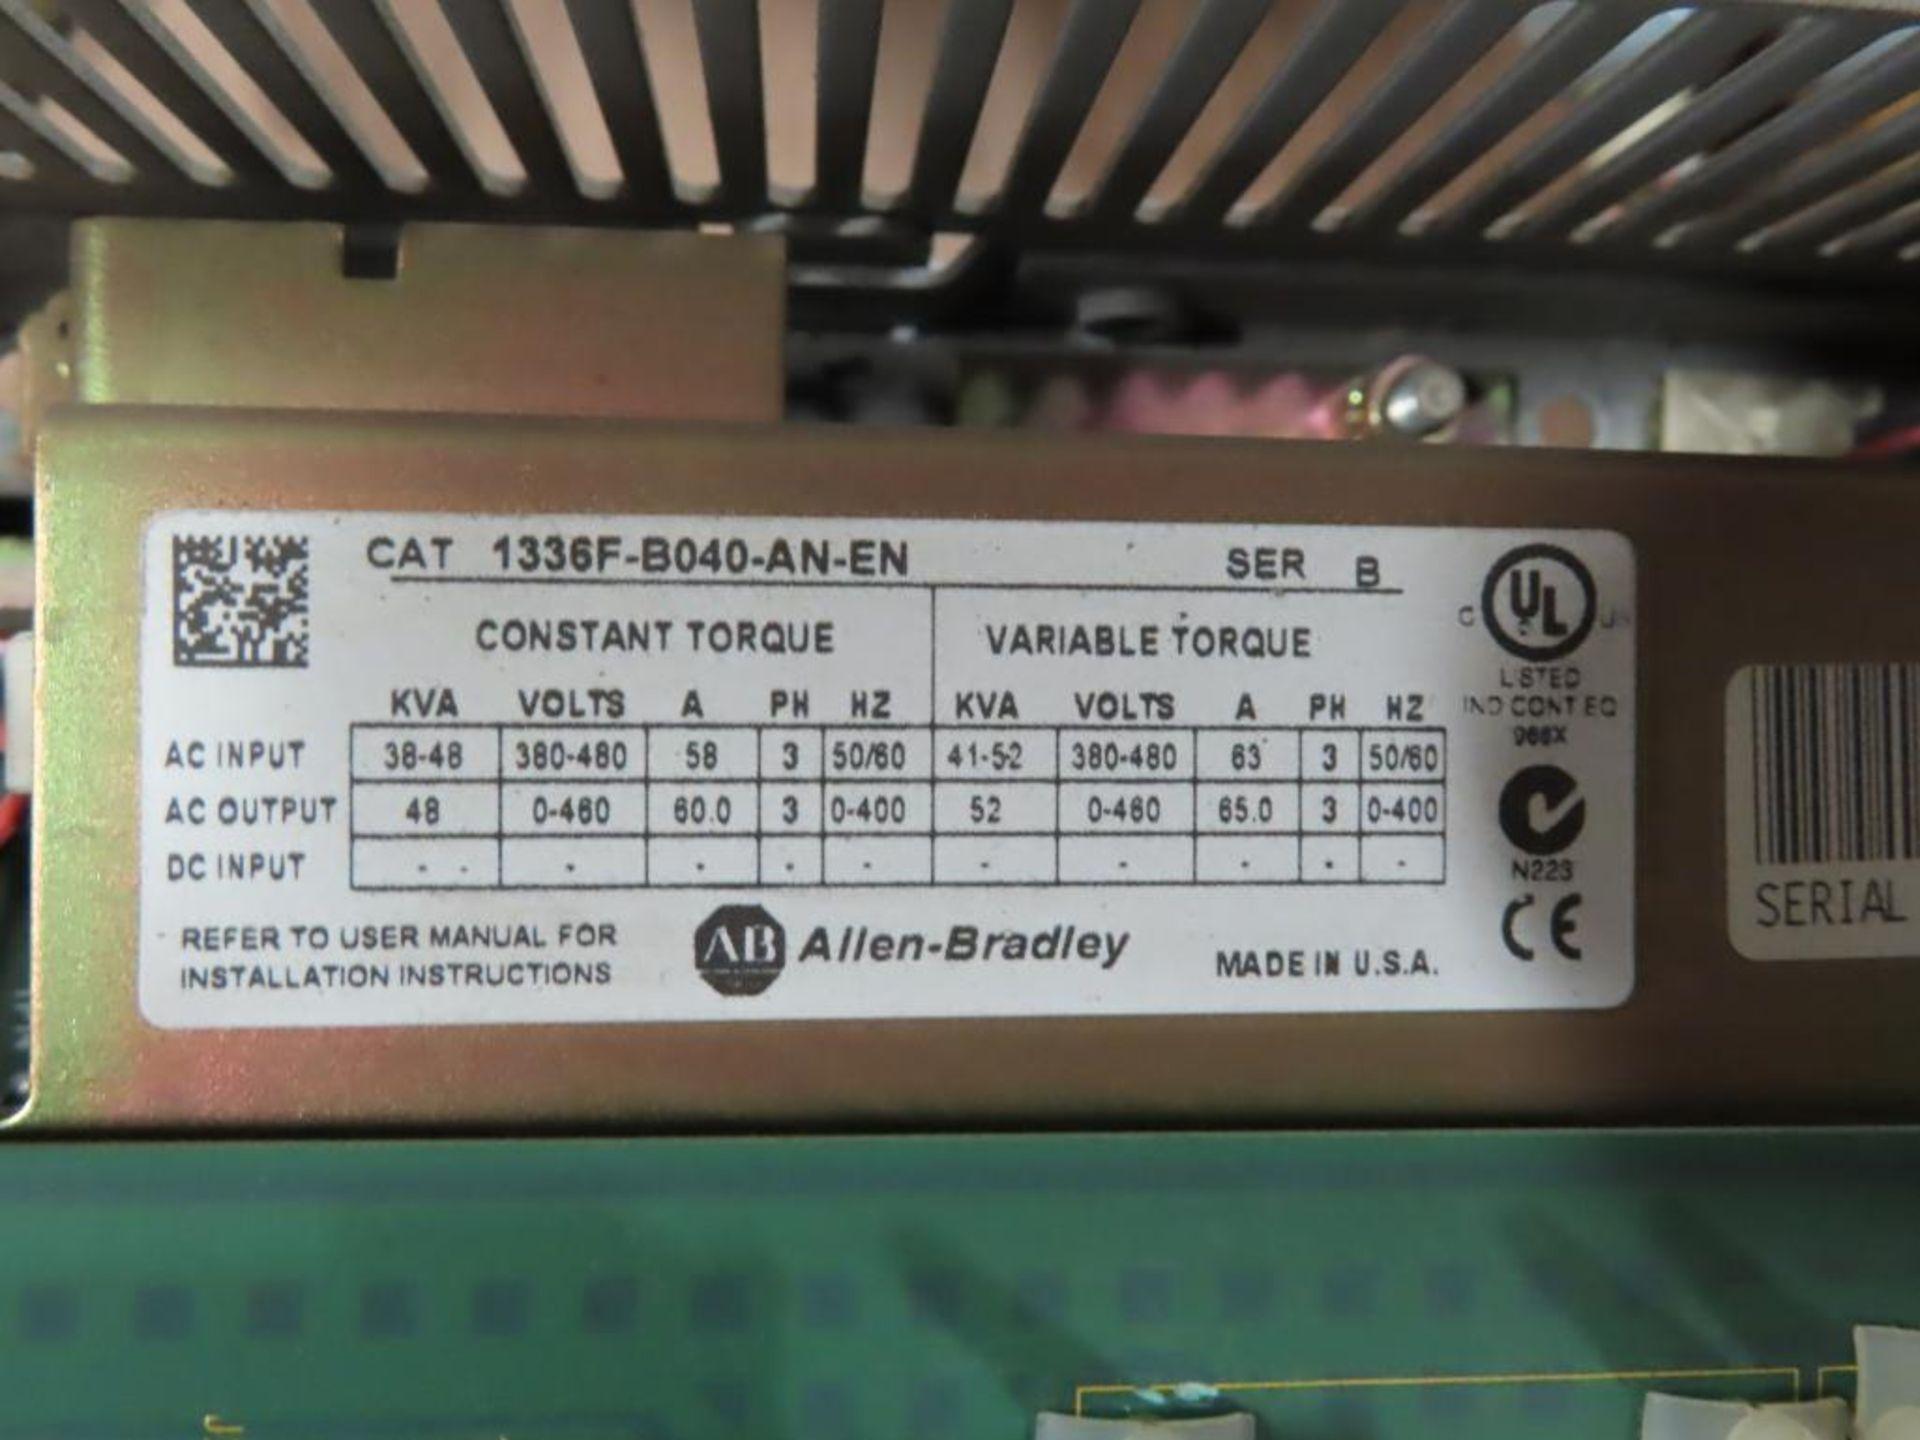 Lot 1 - Allen Bradley 1336 plus II sensorless vector drive catalog 1336F-B040-AN-EN.